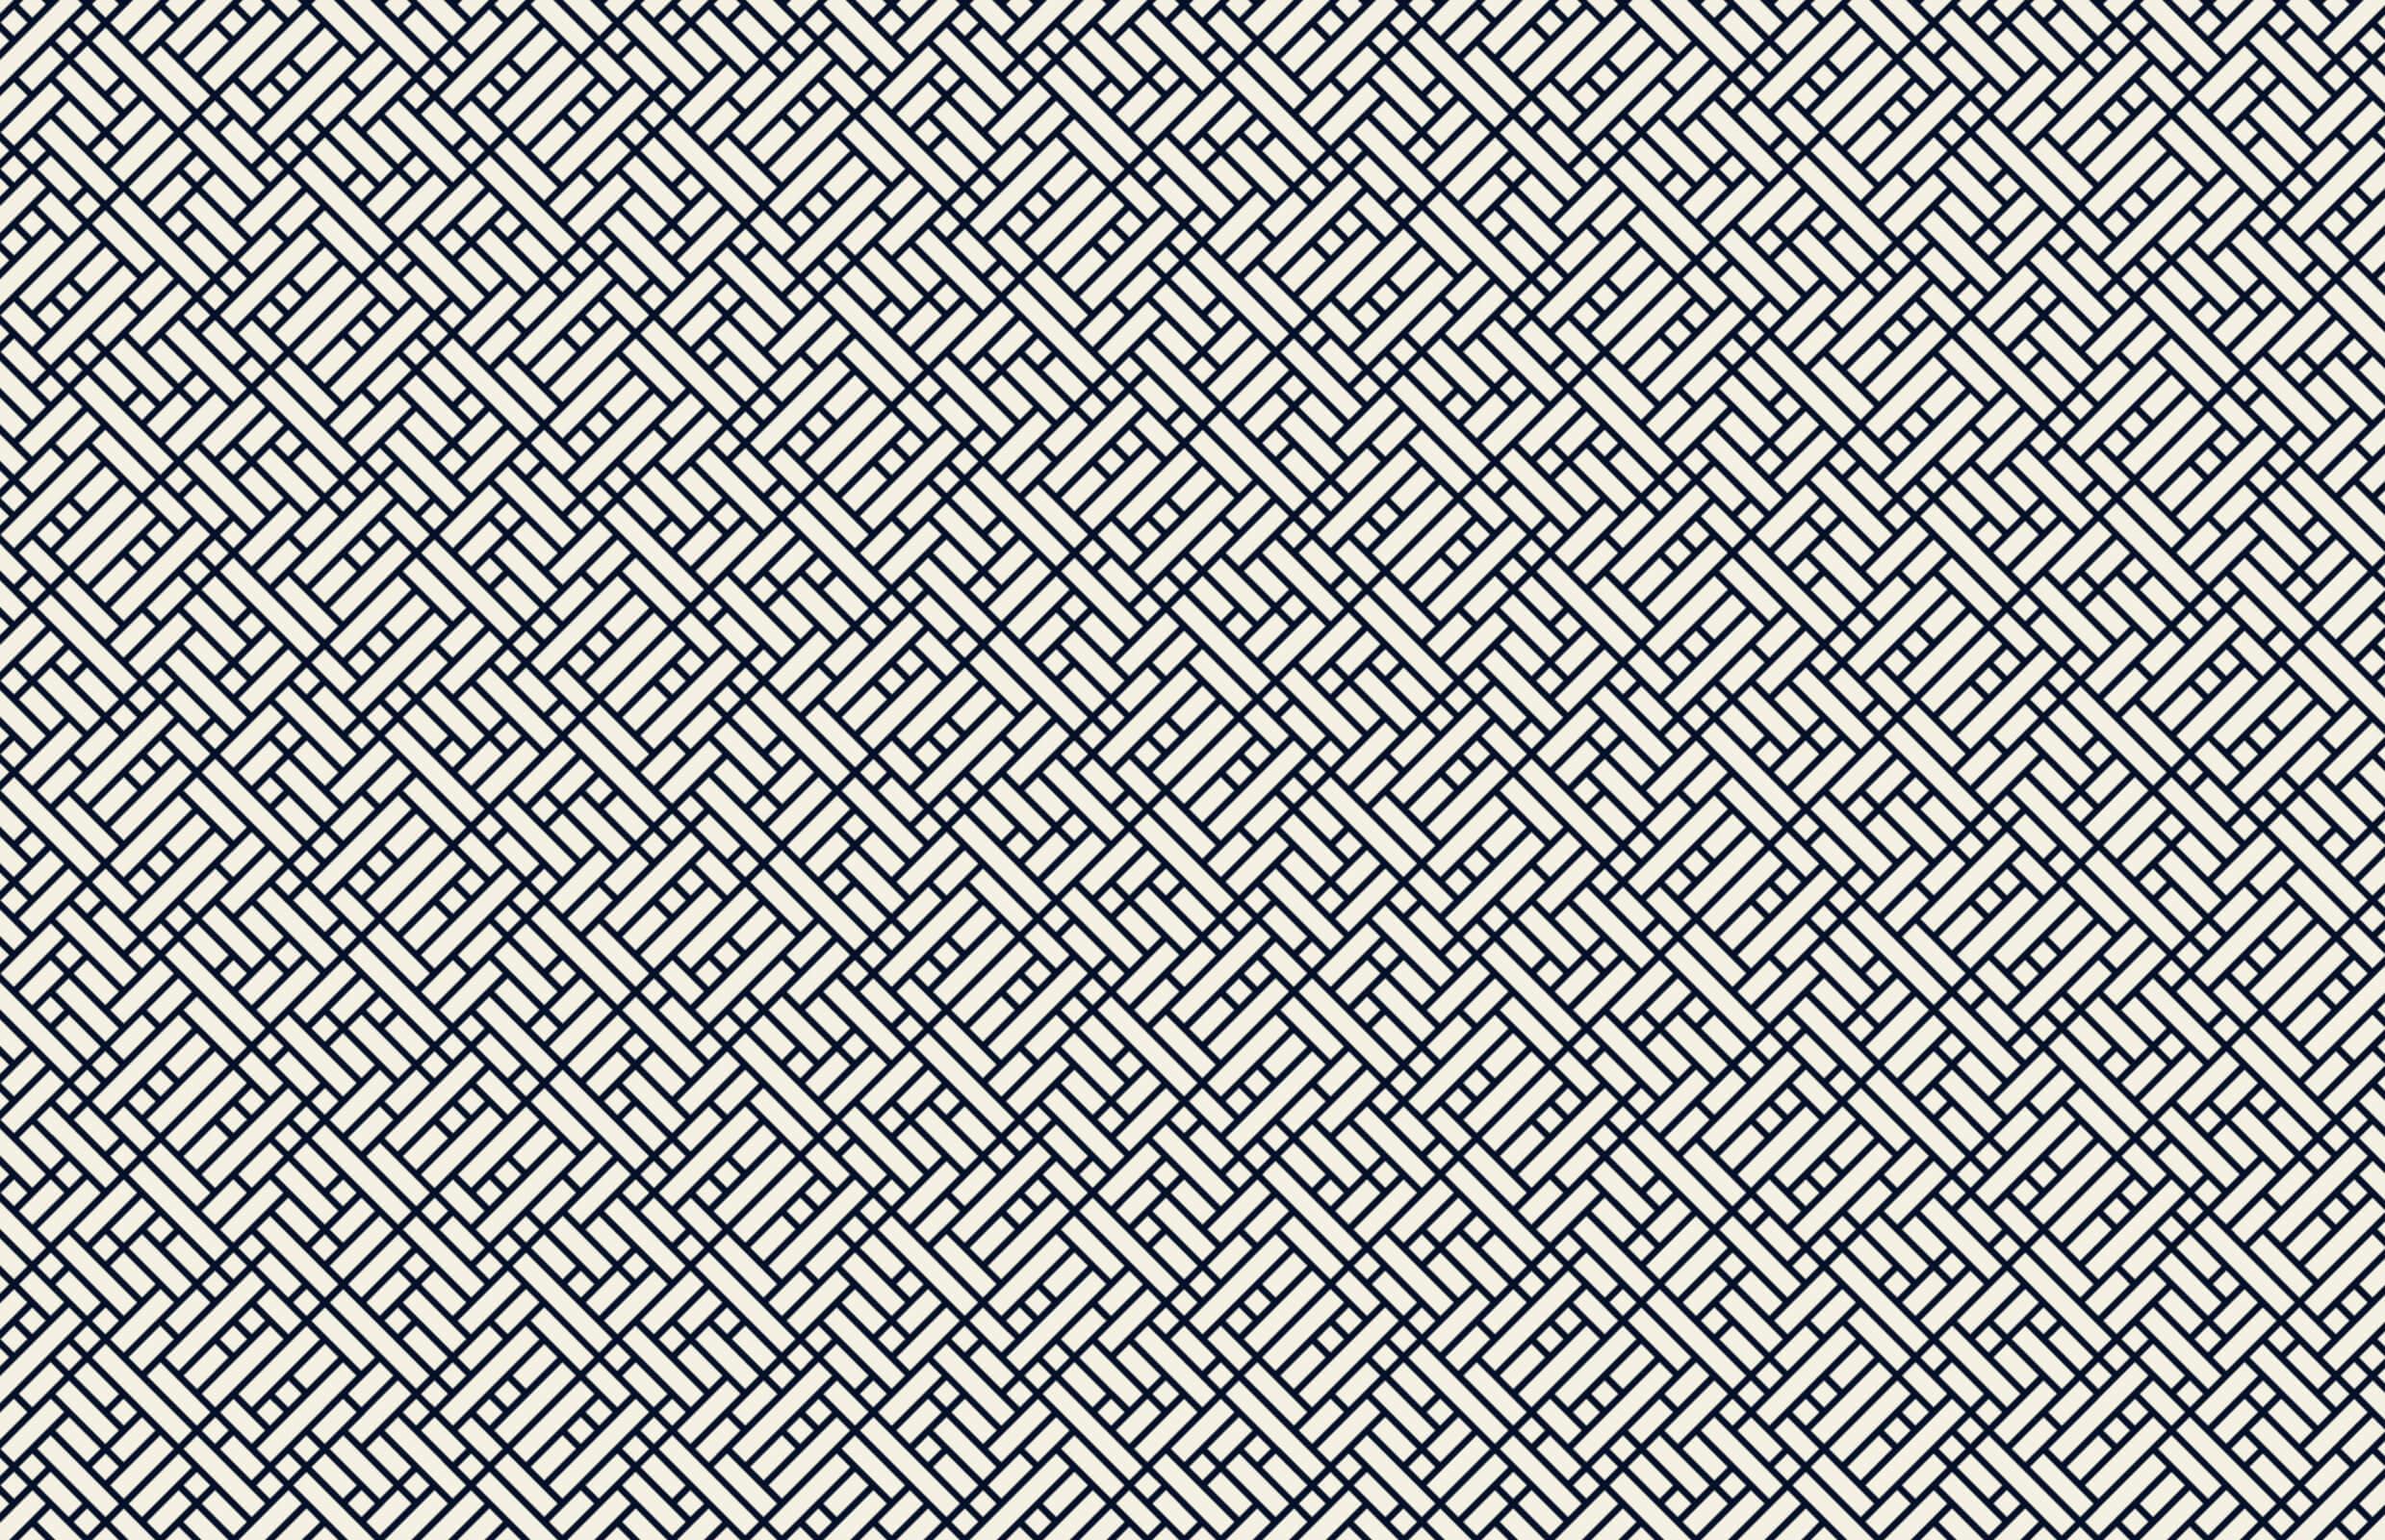 Einzelsorten_4-2xePPrcuXpisQtR